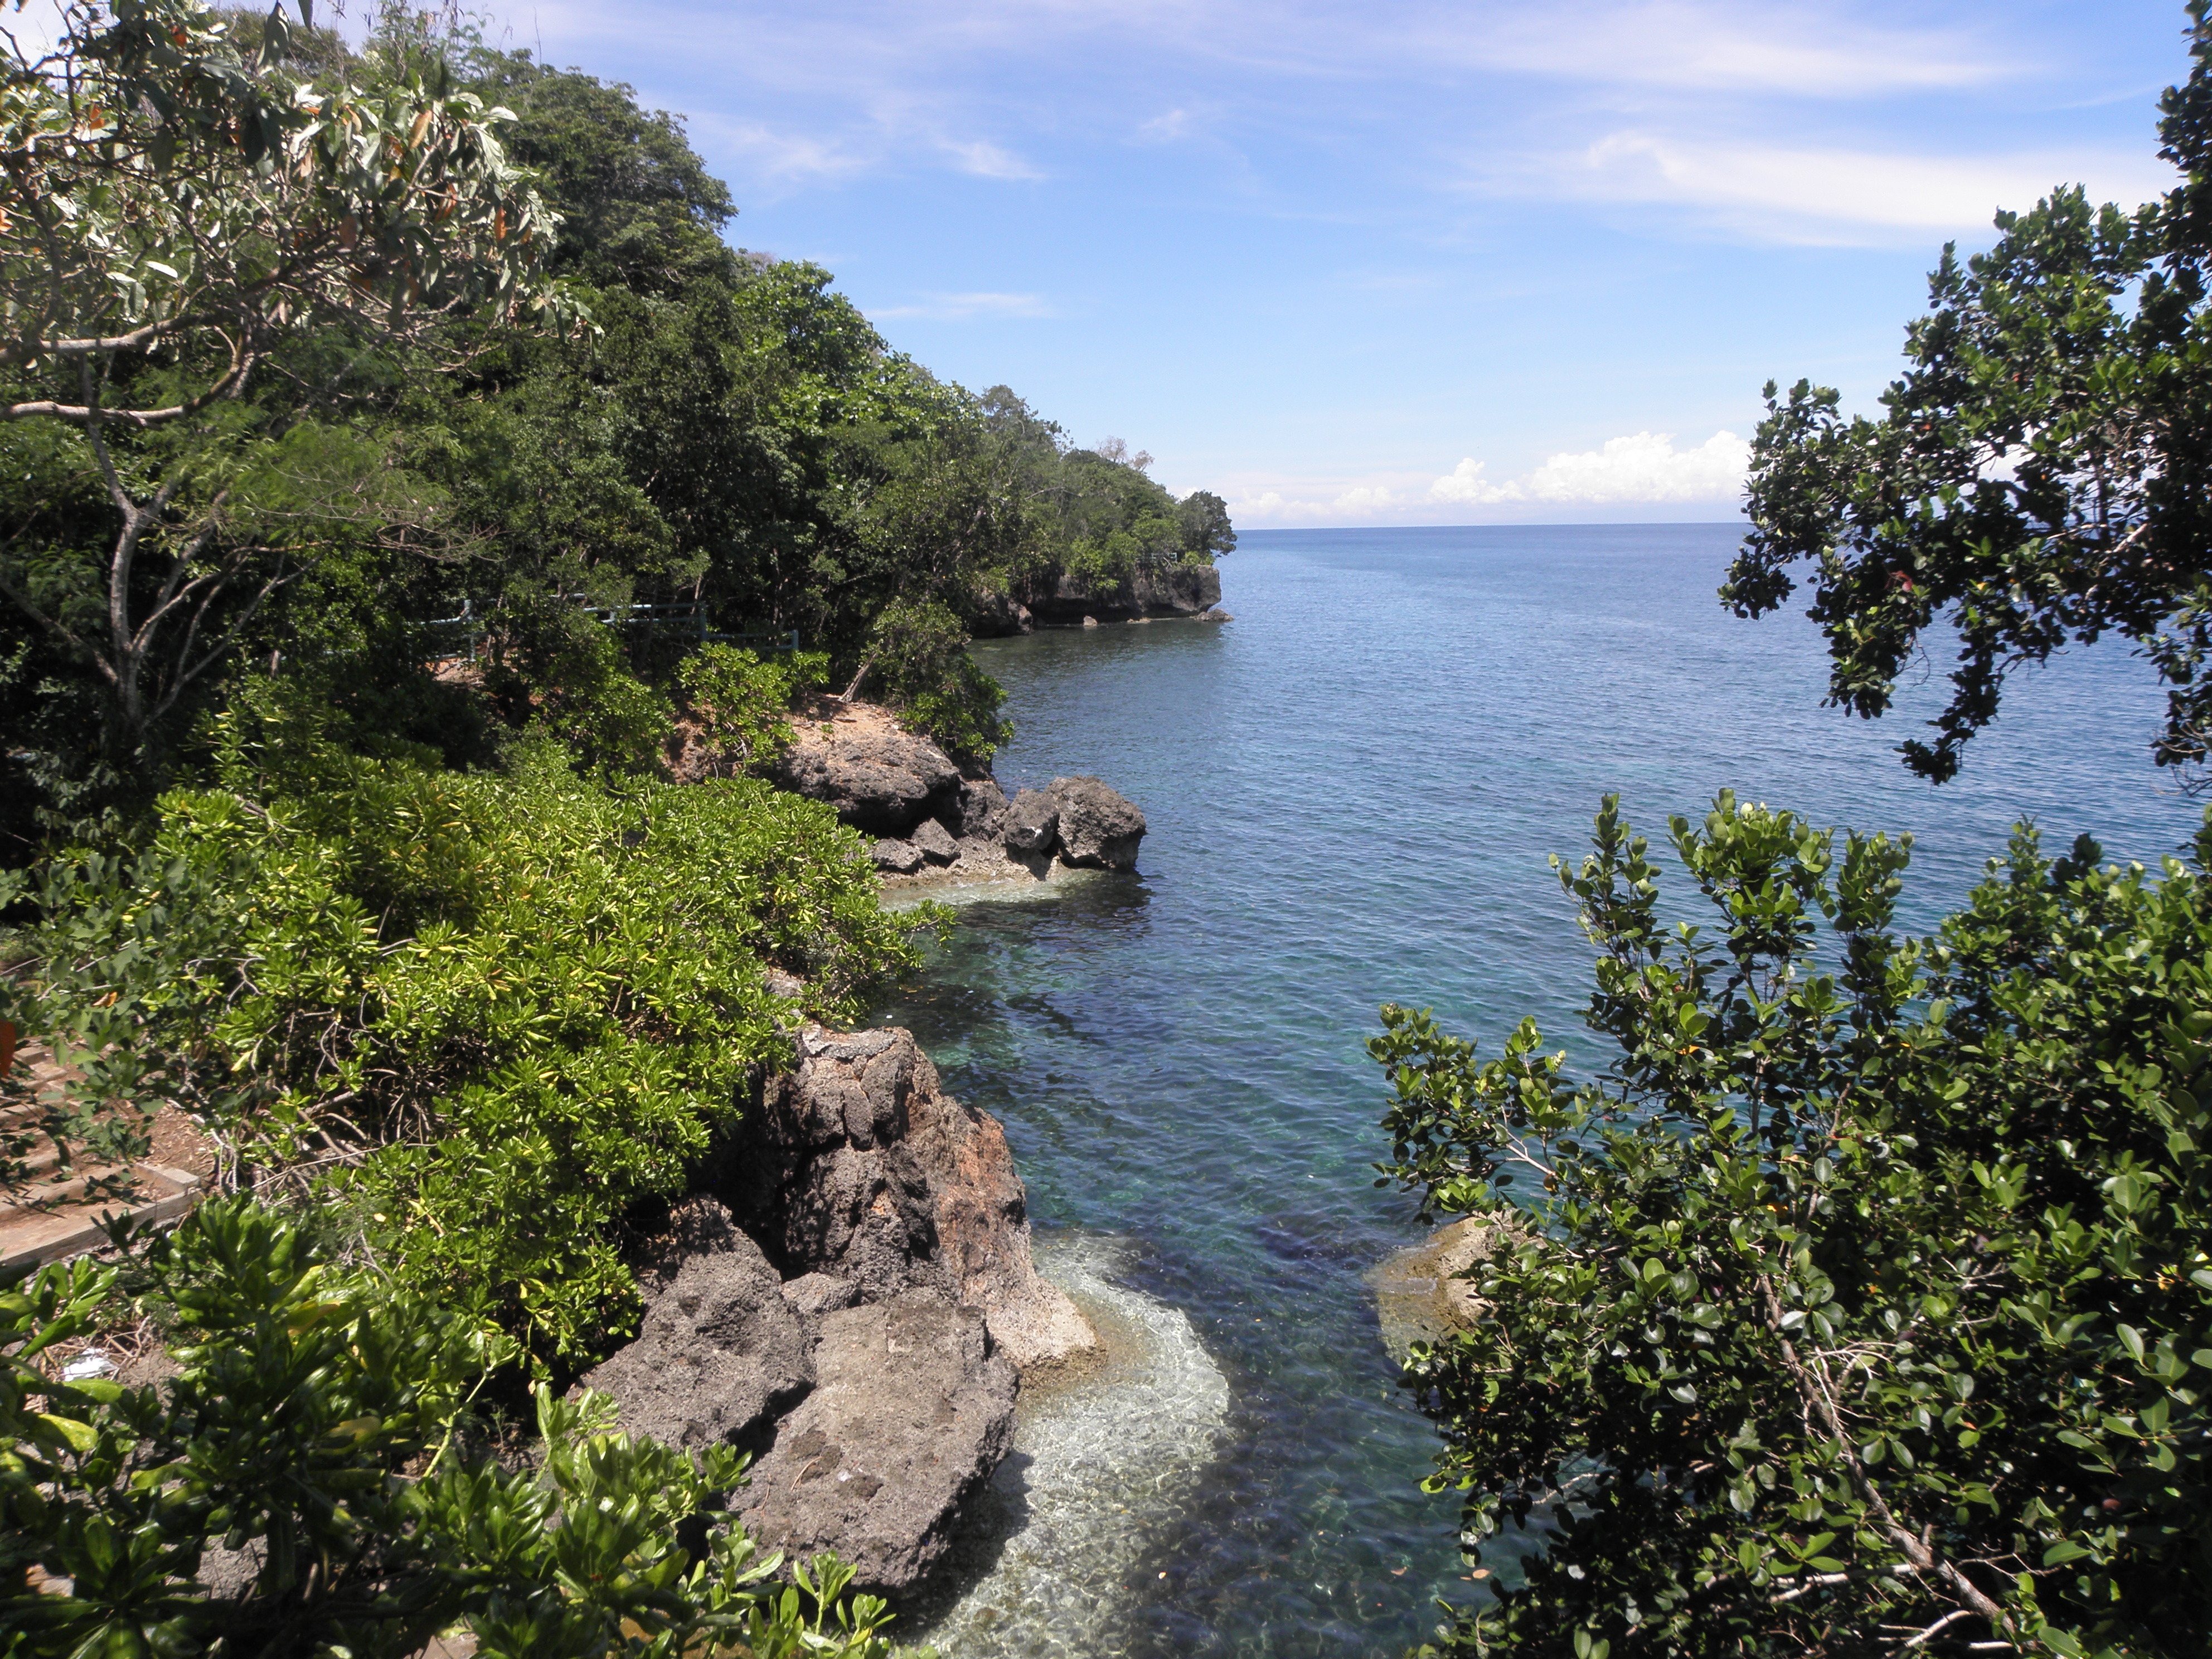 Initao-Libertad Protected Landscape